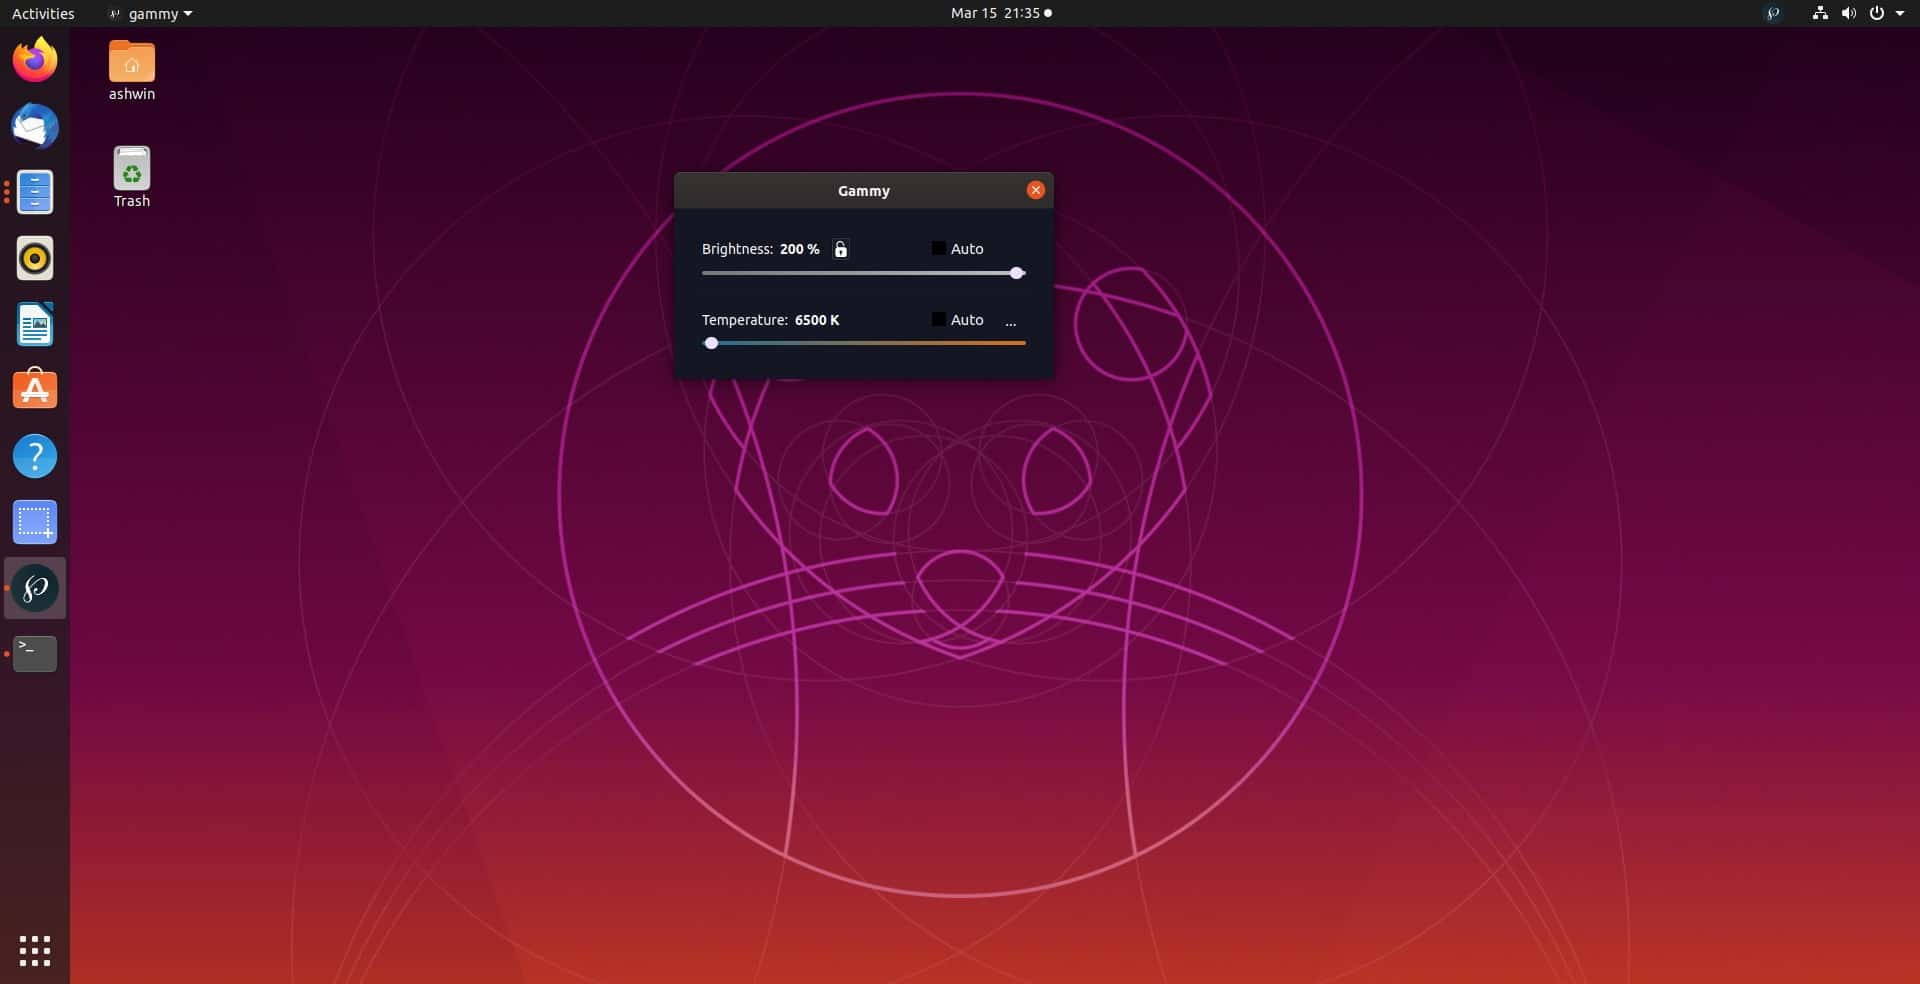 Gammy Linux 200 percent